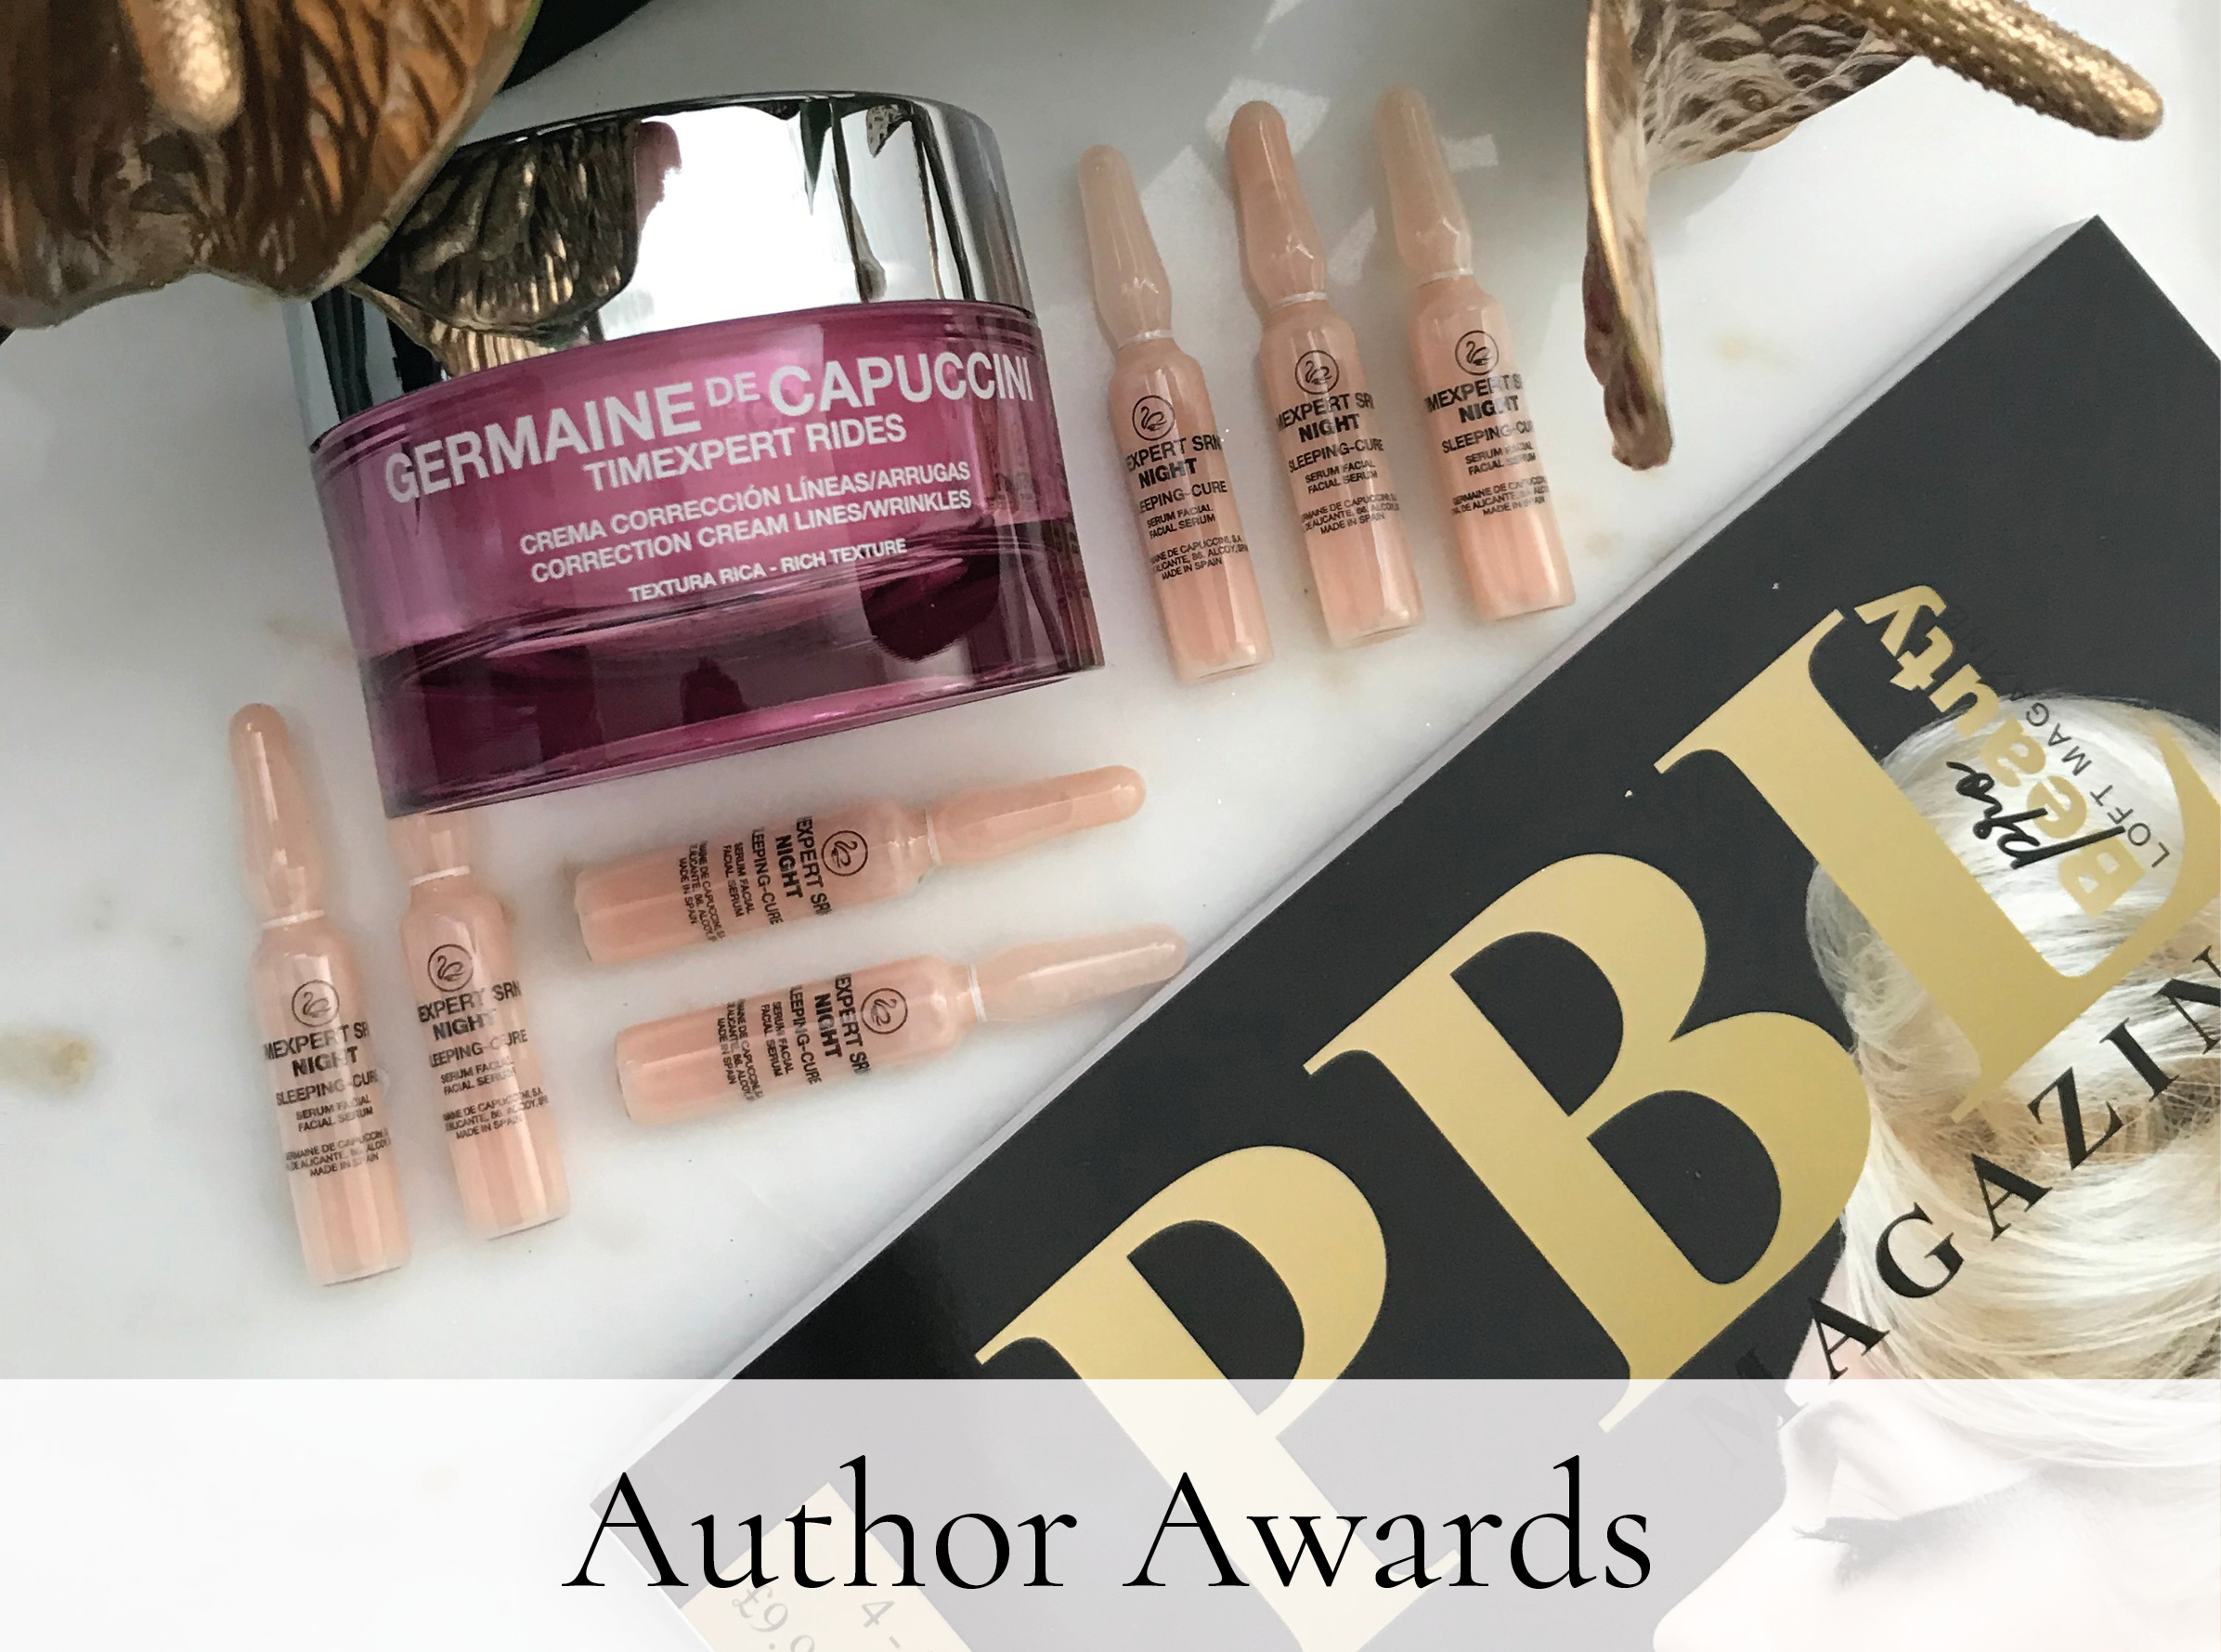 Auhtor Awards901830.jpg